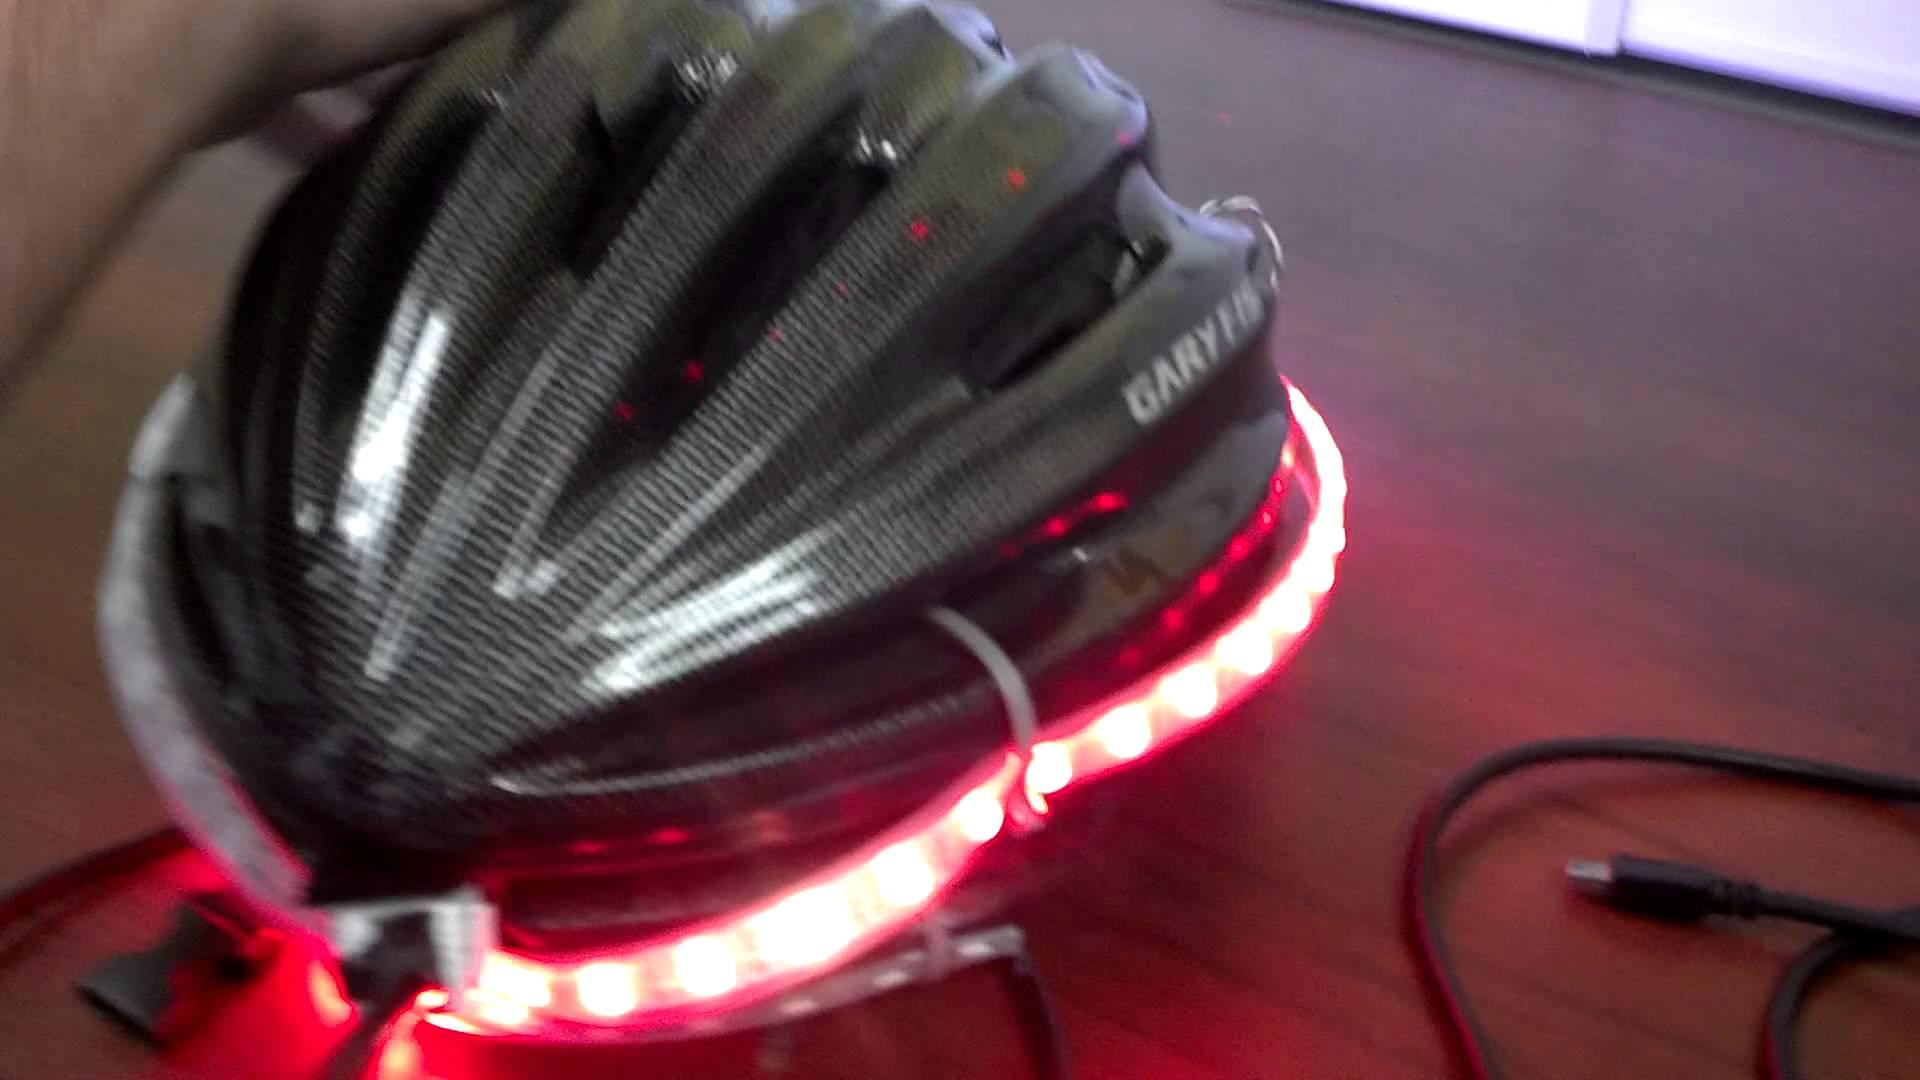 Turn Signal Bike Helmet Wearable on Turn Signal Circuit